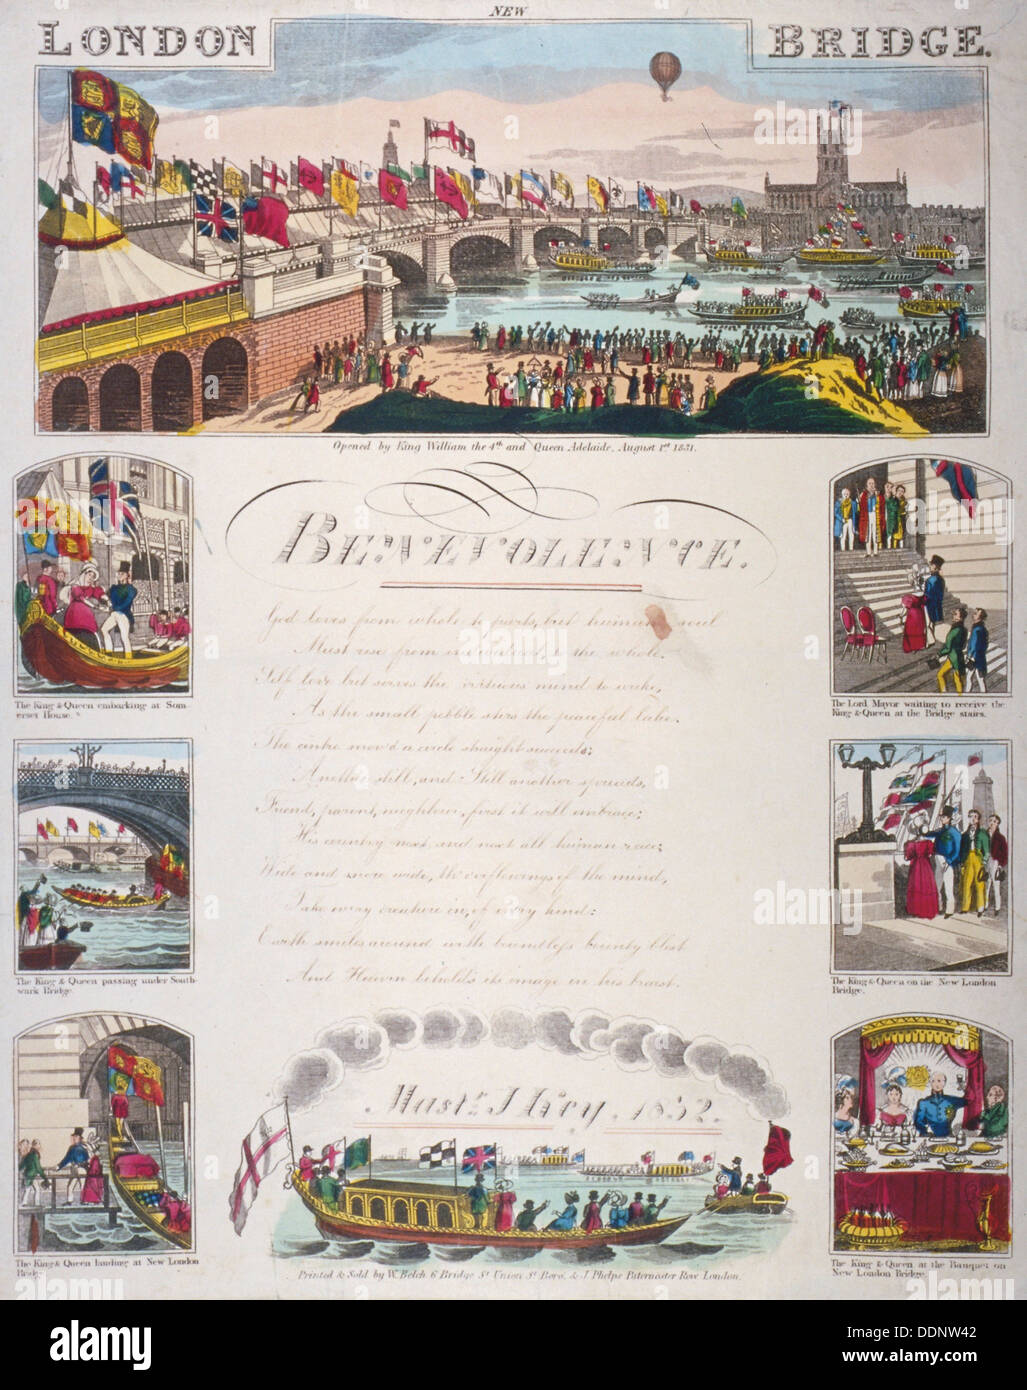 Opening ceremony of the new London Bridge, 1831. Artist: Anon - Stock Image